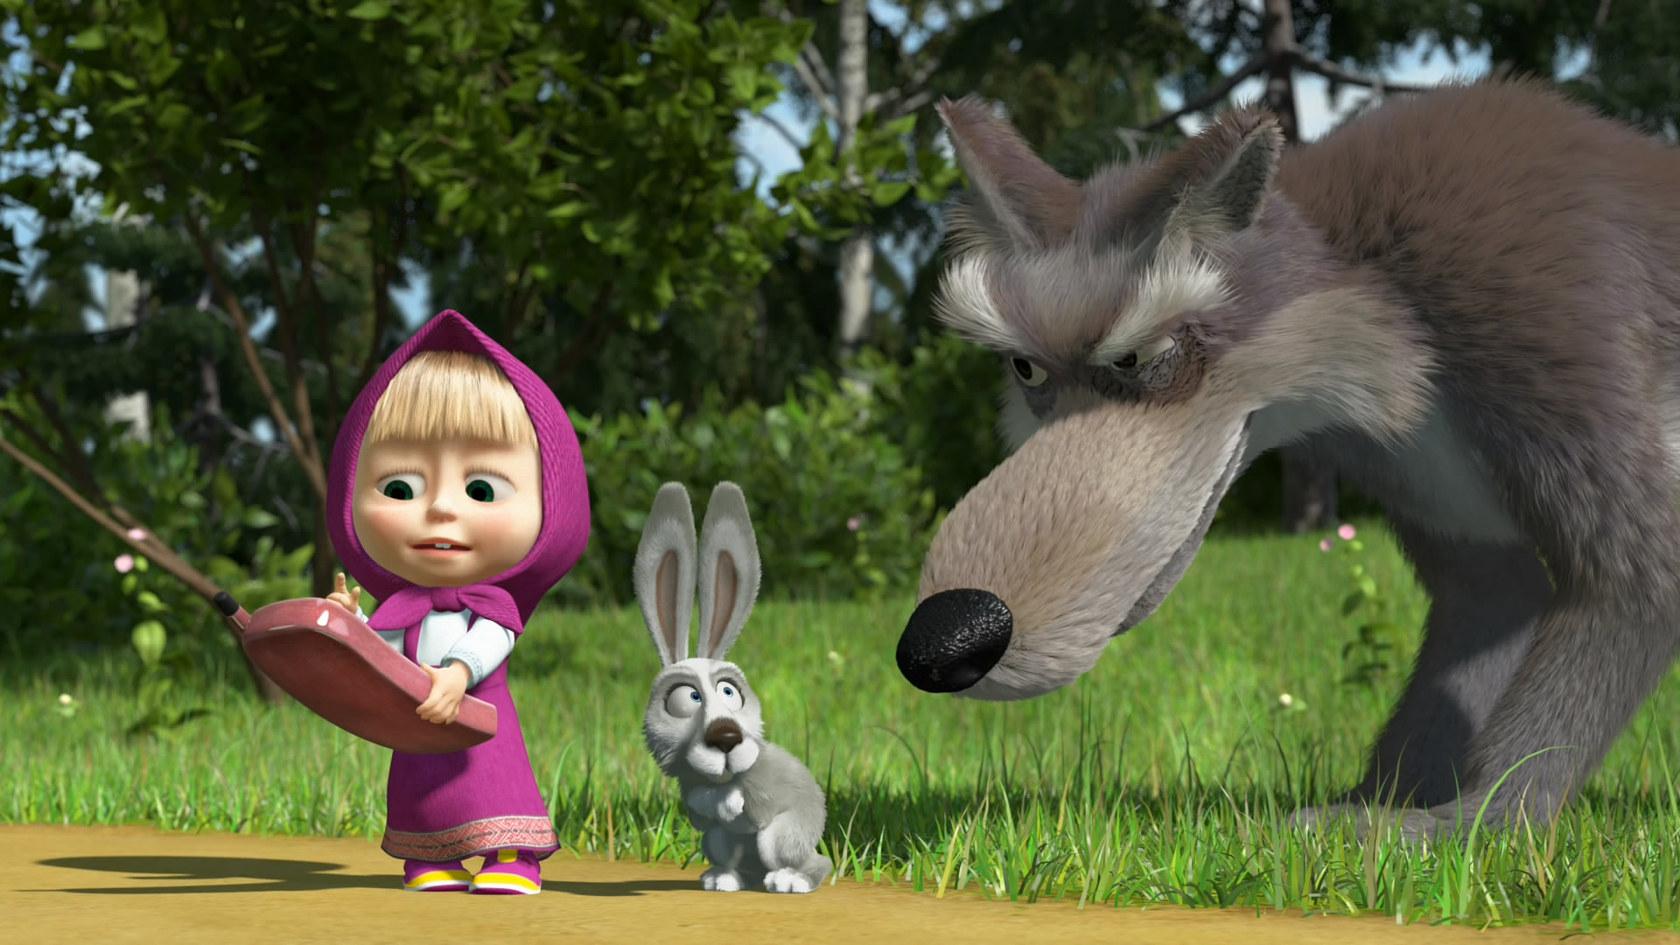 И медведь девочка заяц волк телефон